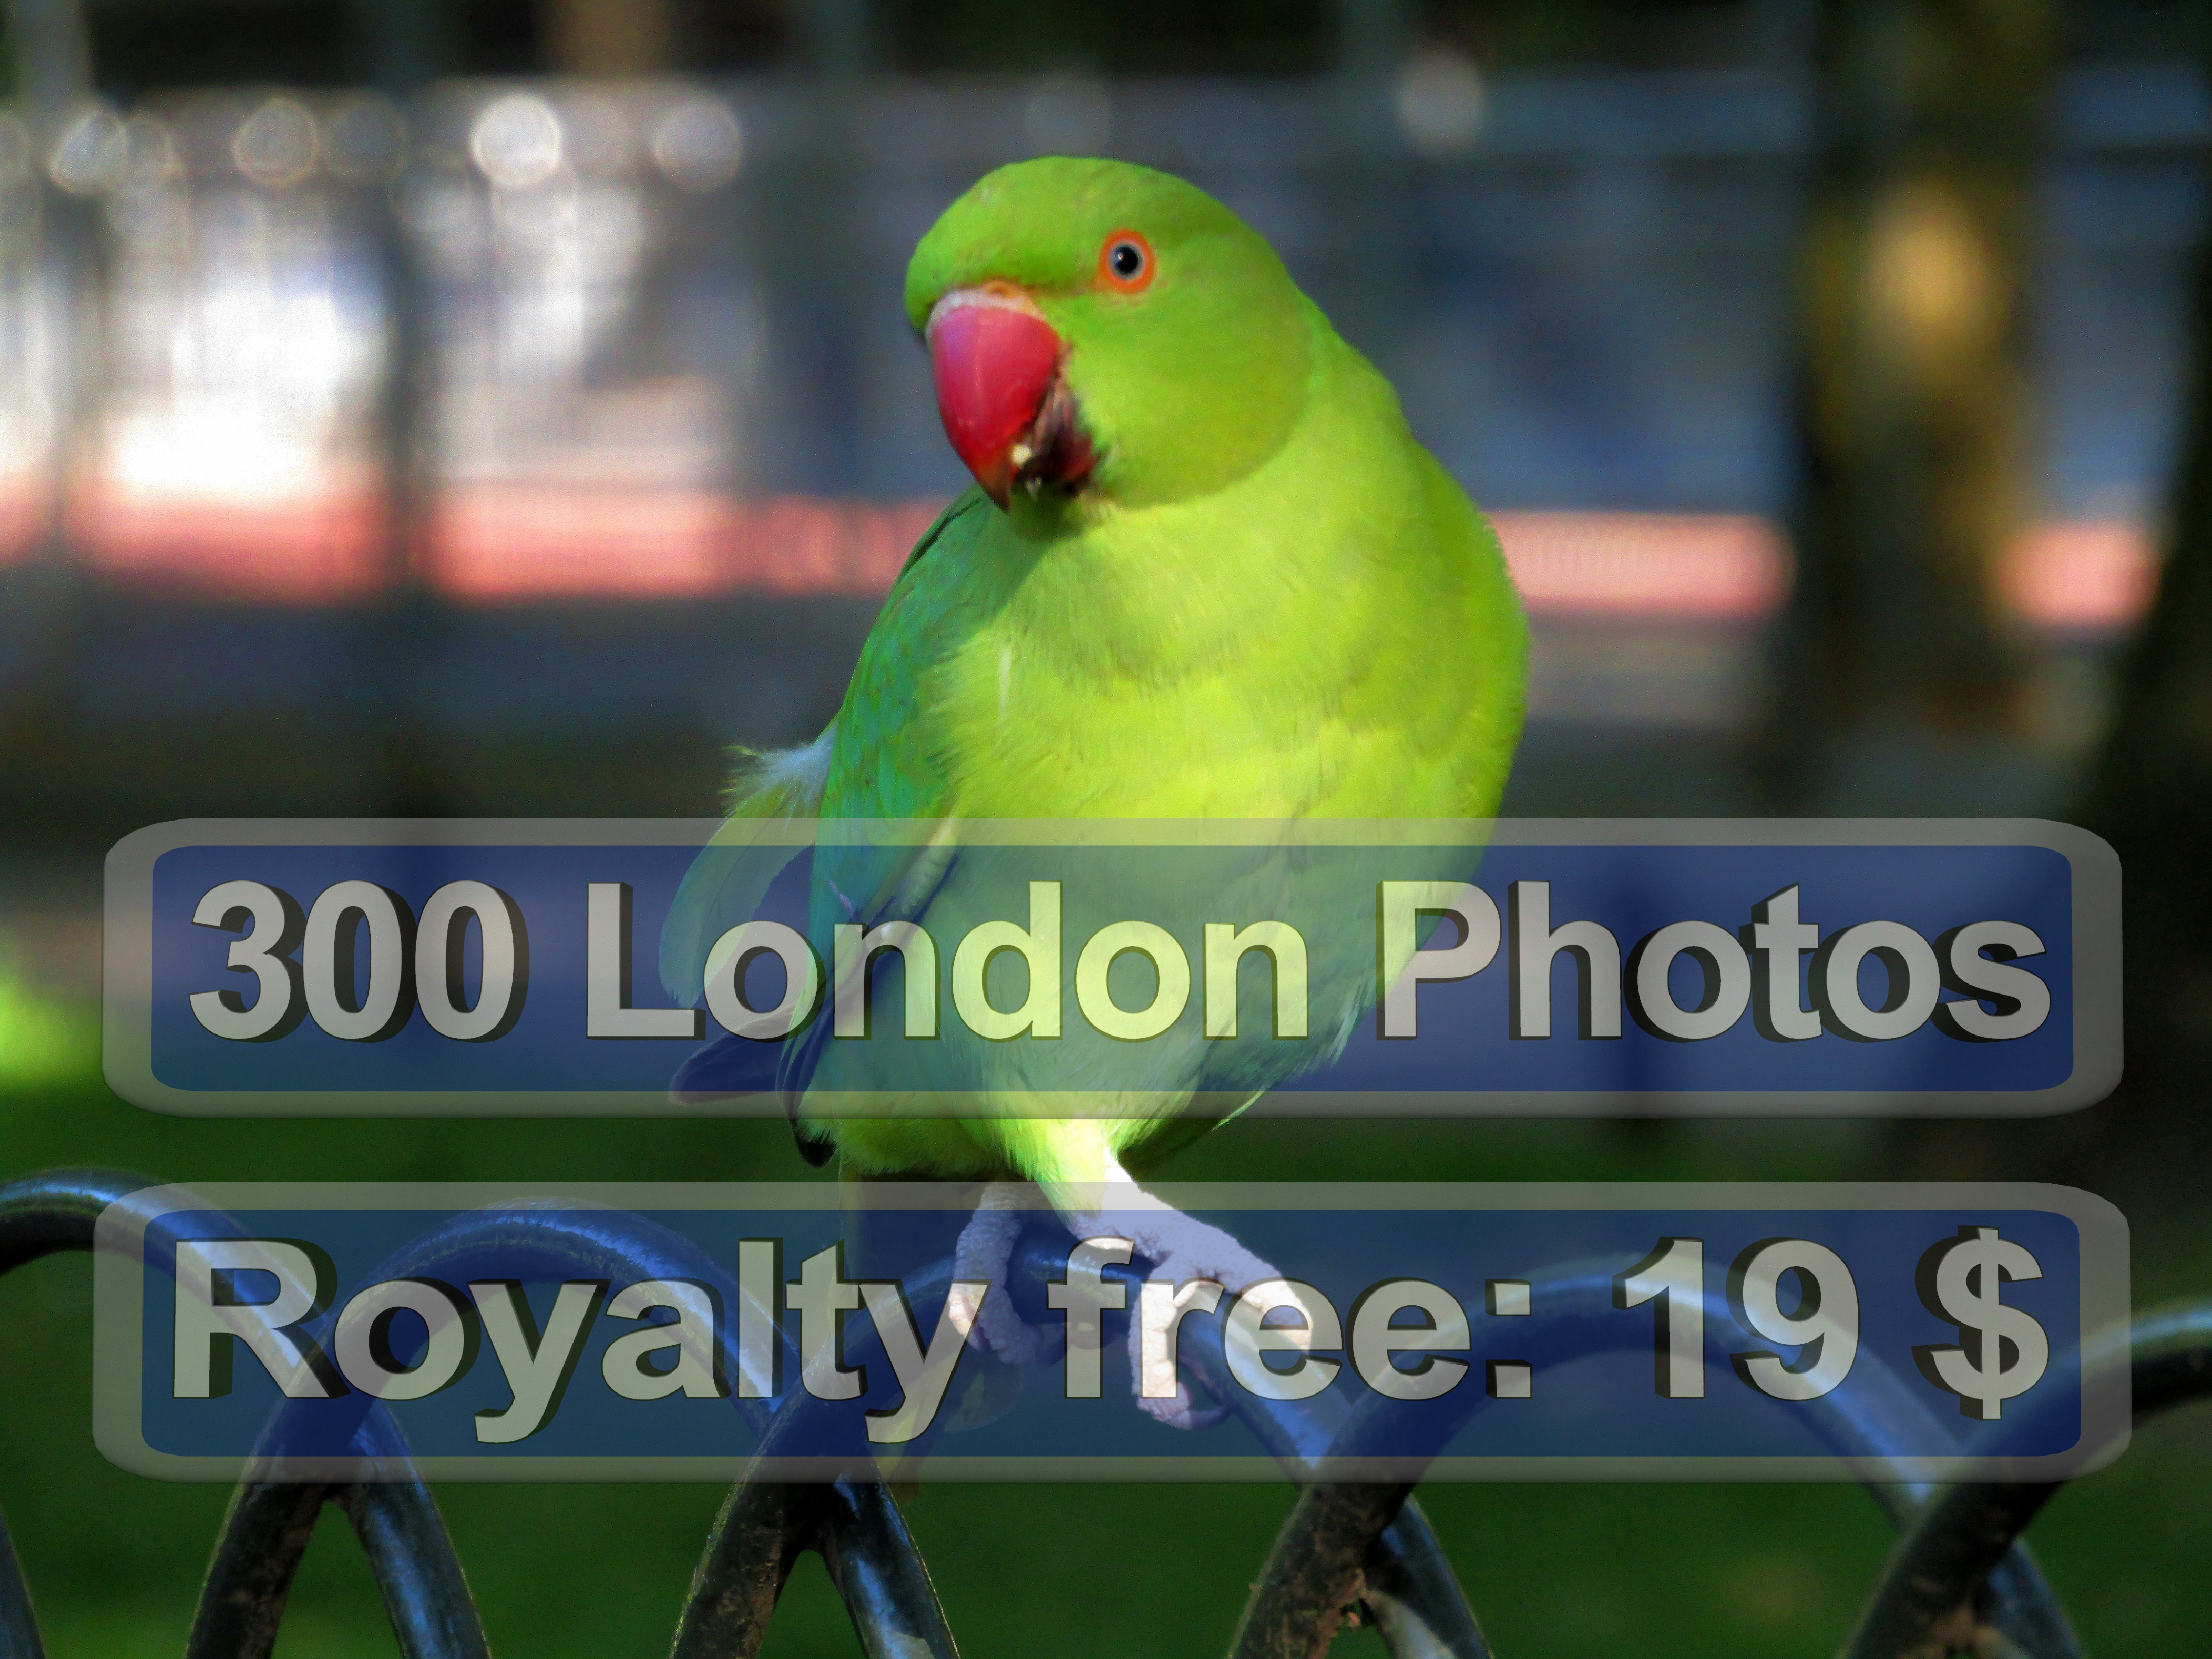 London Photo Gifts